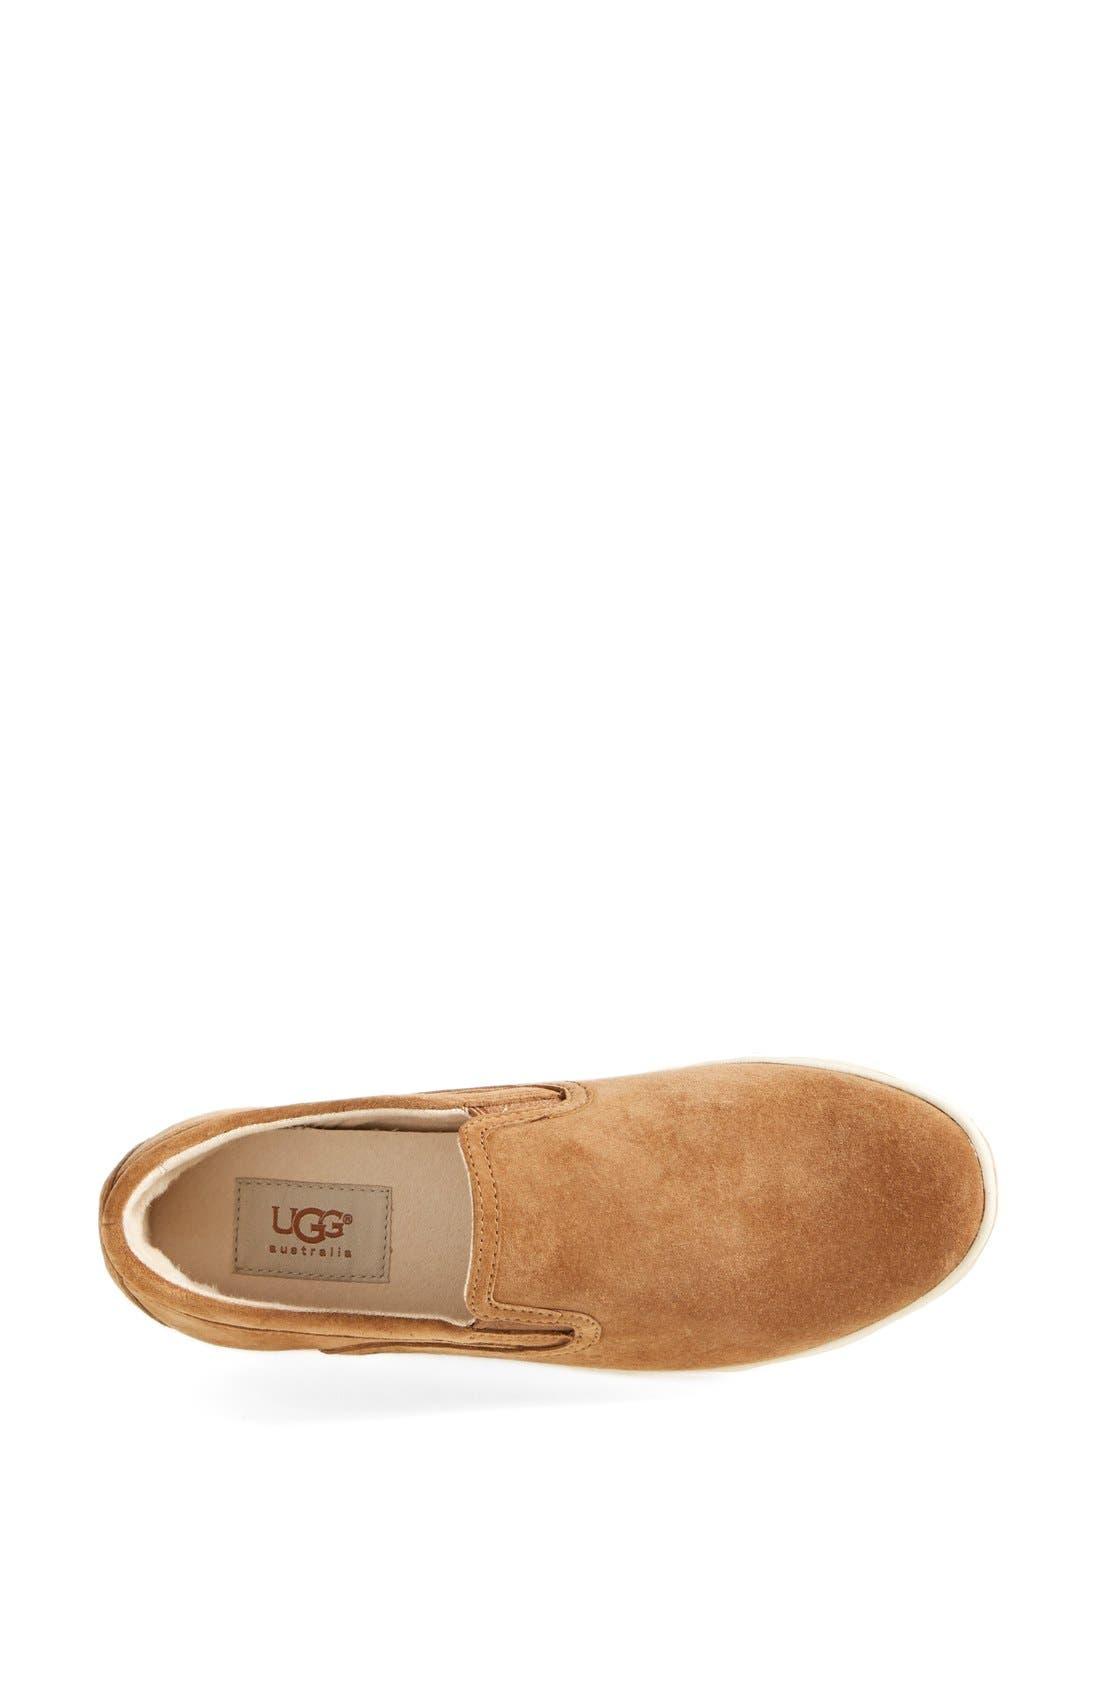 Alternate Image 3  - UGG® Fierce Water Resistant Suede Slip-On Sneaker (Nordstrom Exclusive Color) (Women)